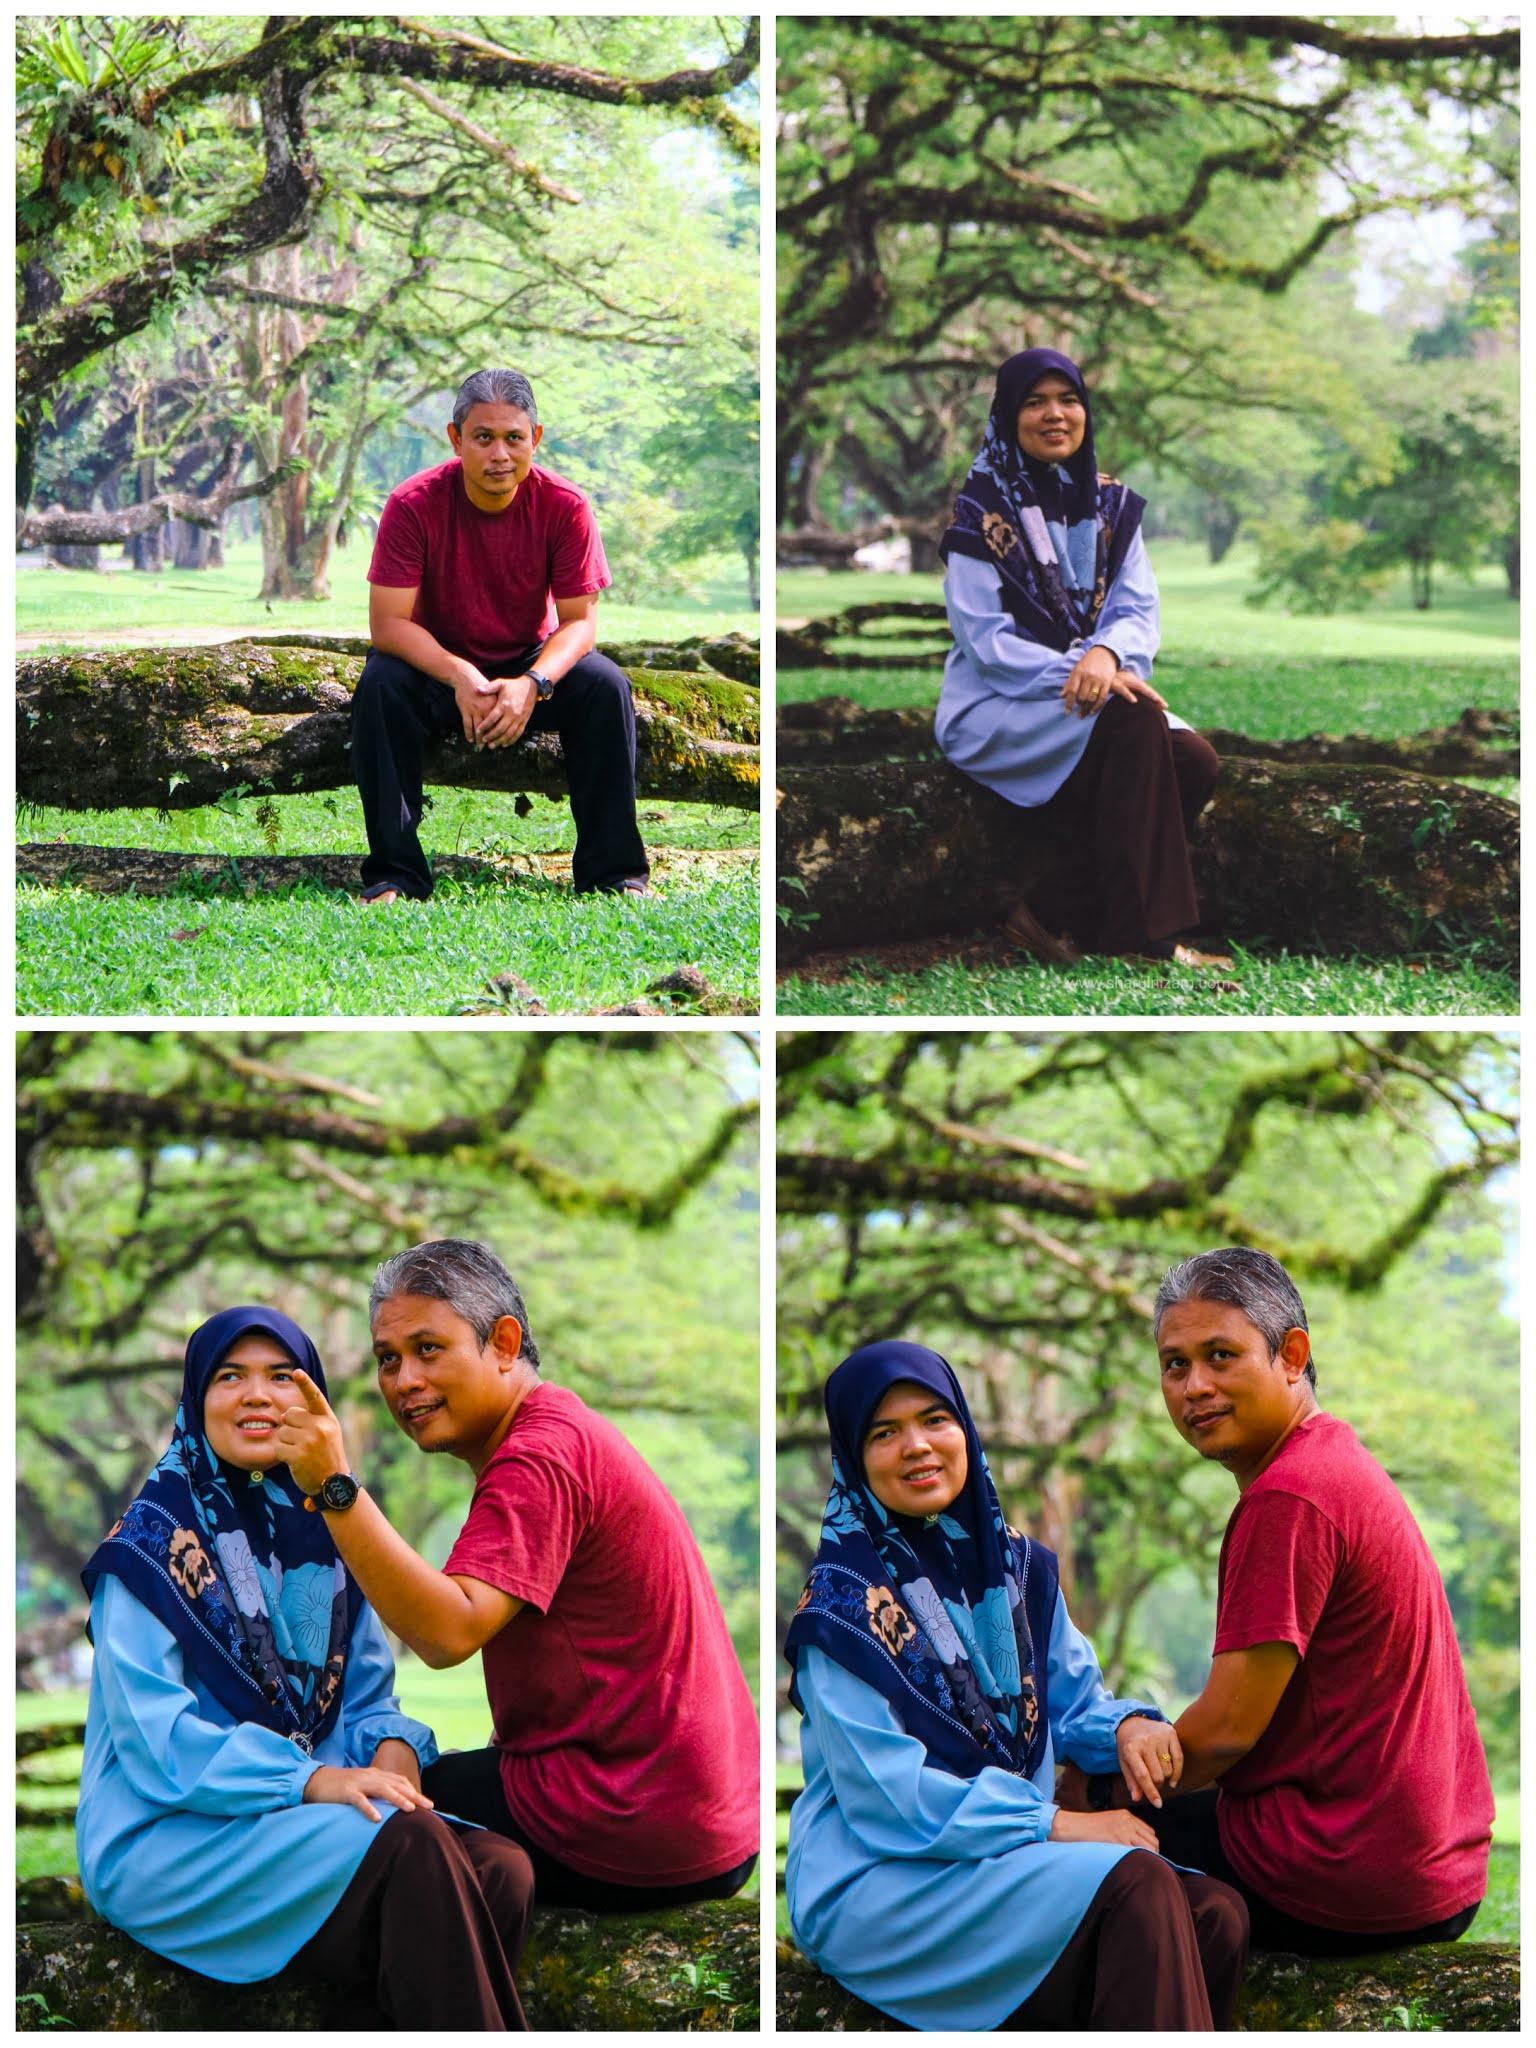 Seiring Dan Sejalan Di Taman Tasik Taiping, Perak